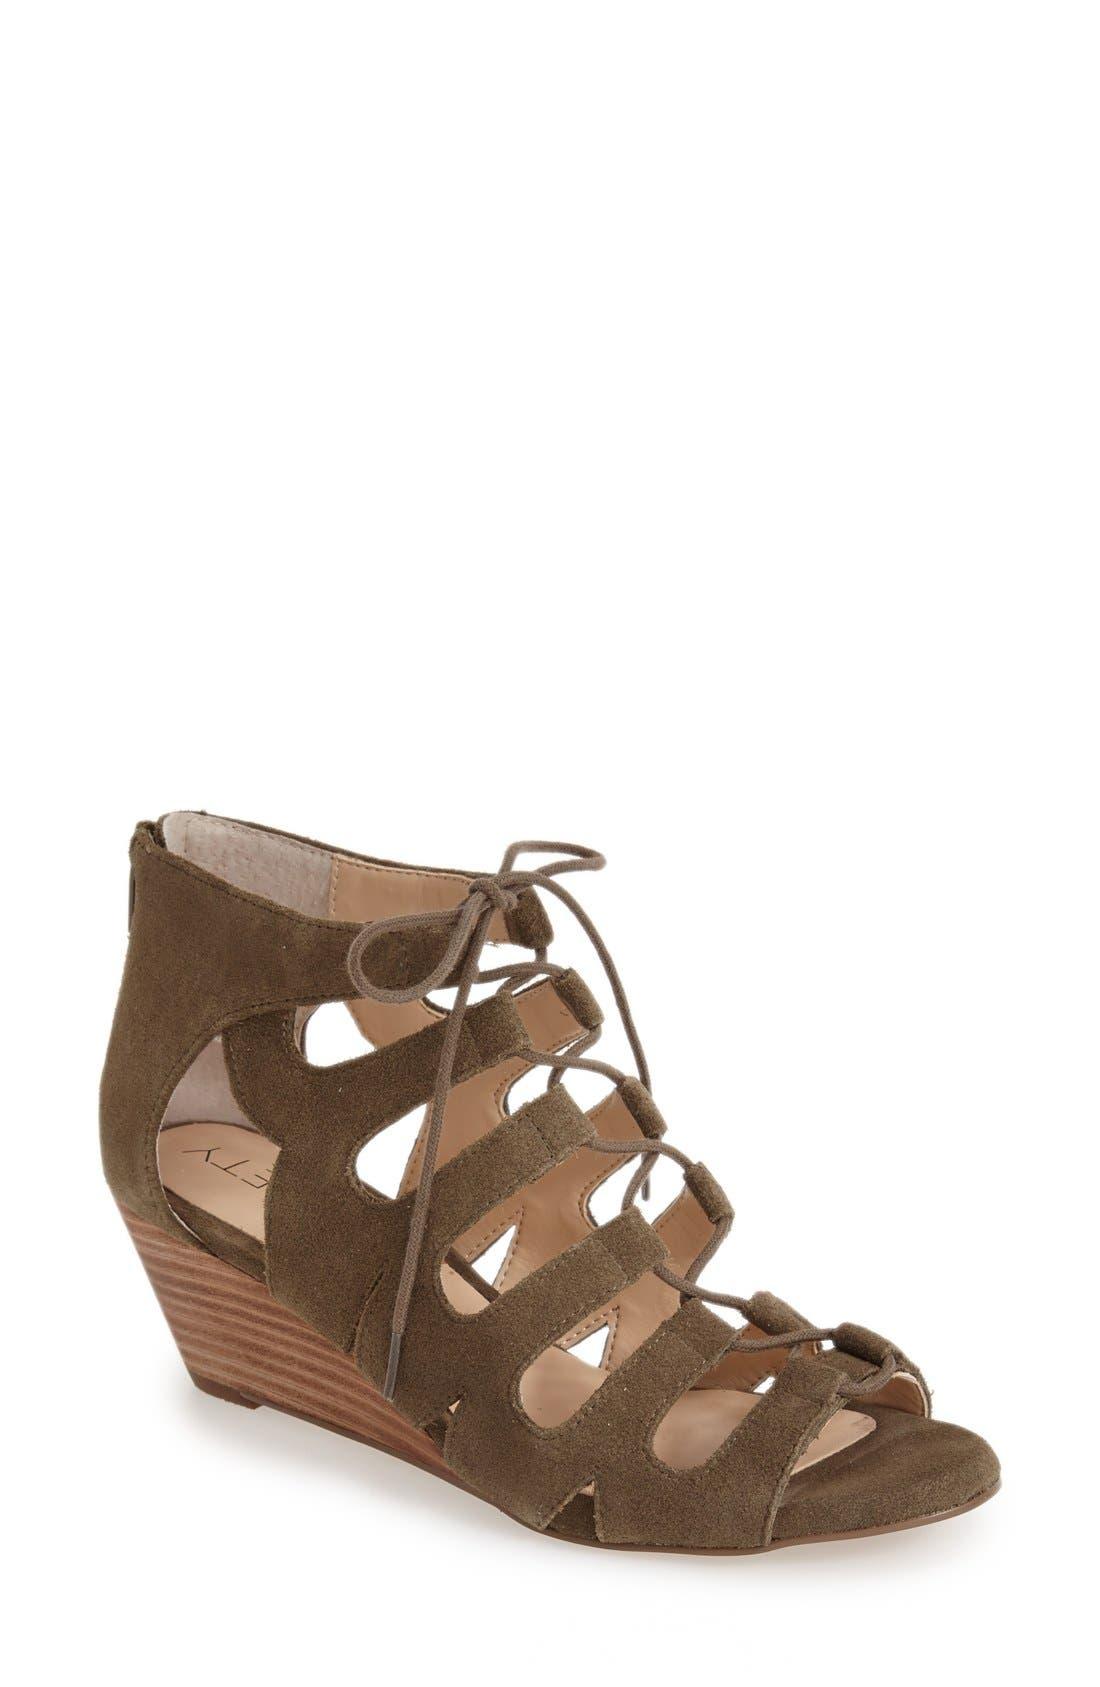 Main Image - Sole Society 'Freyaa' Wedge Sandal (Women)